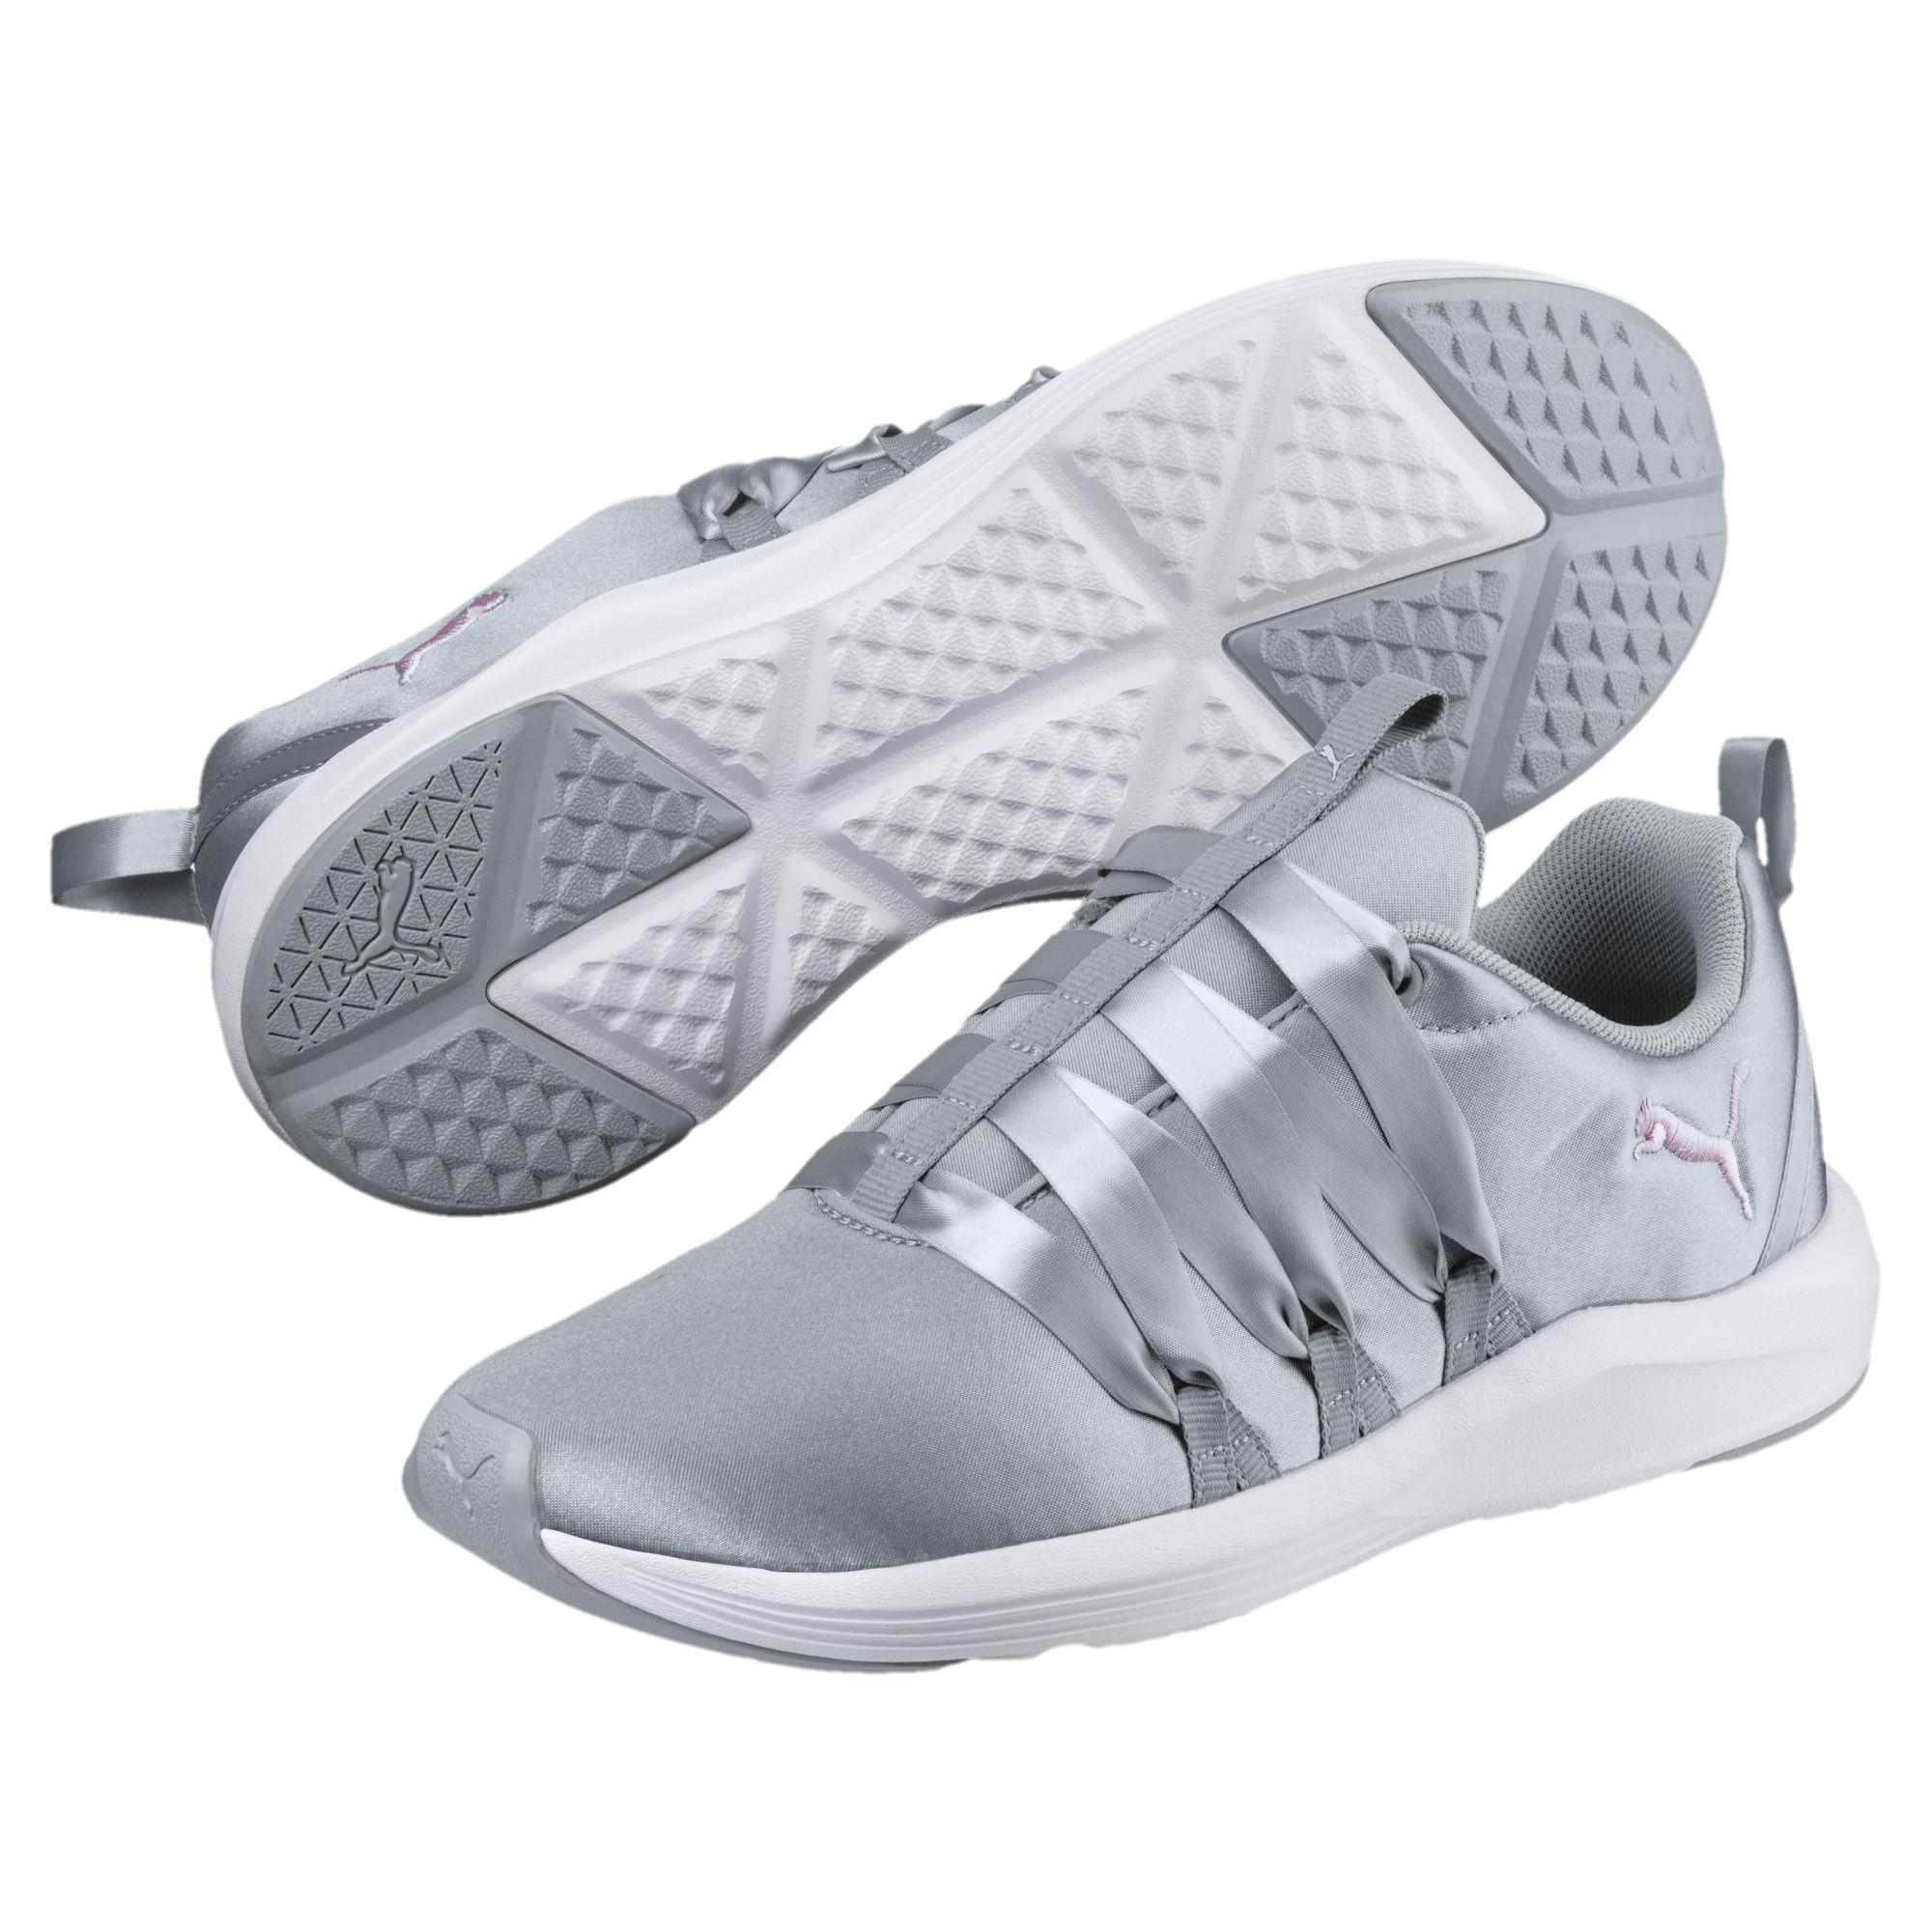 087268fbe133 PUMA - White Prowl Alt Satin Women s Training Shoes - Lyst. View fullscreen